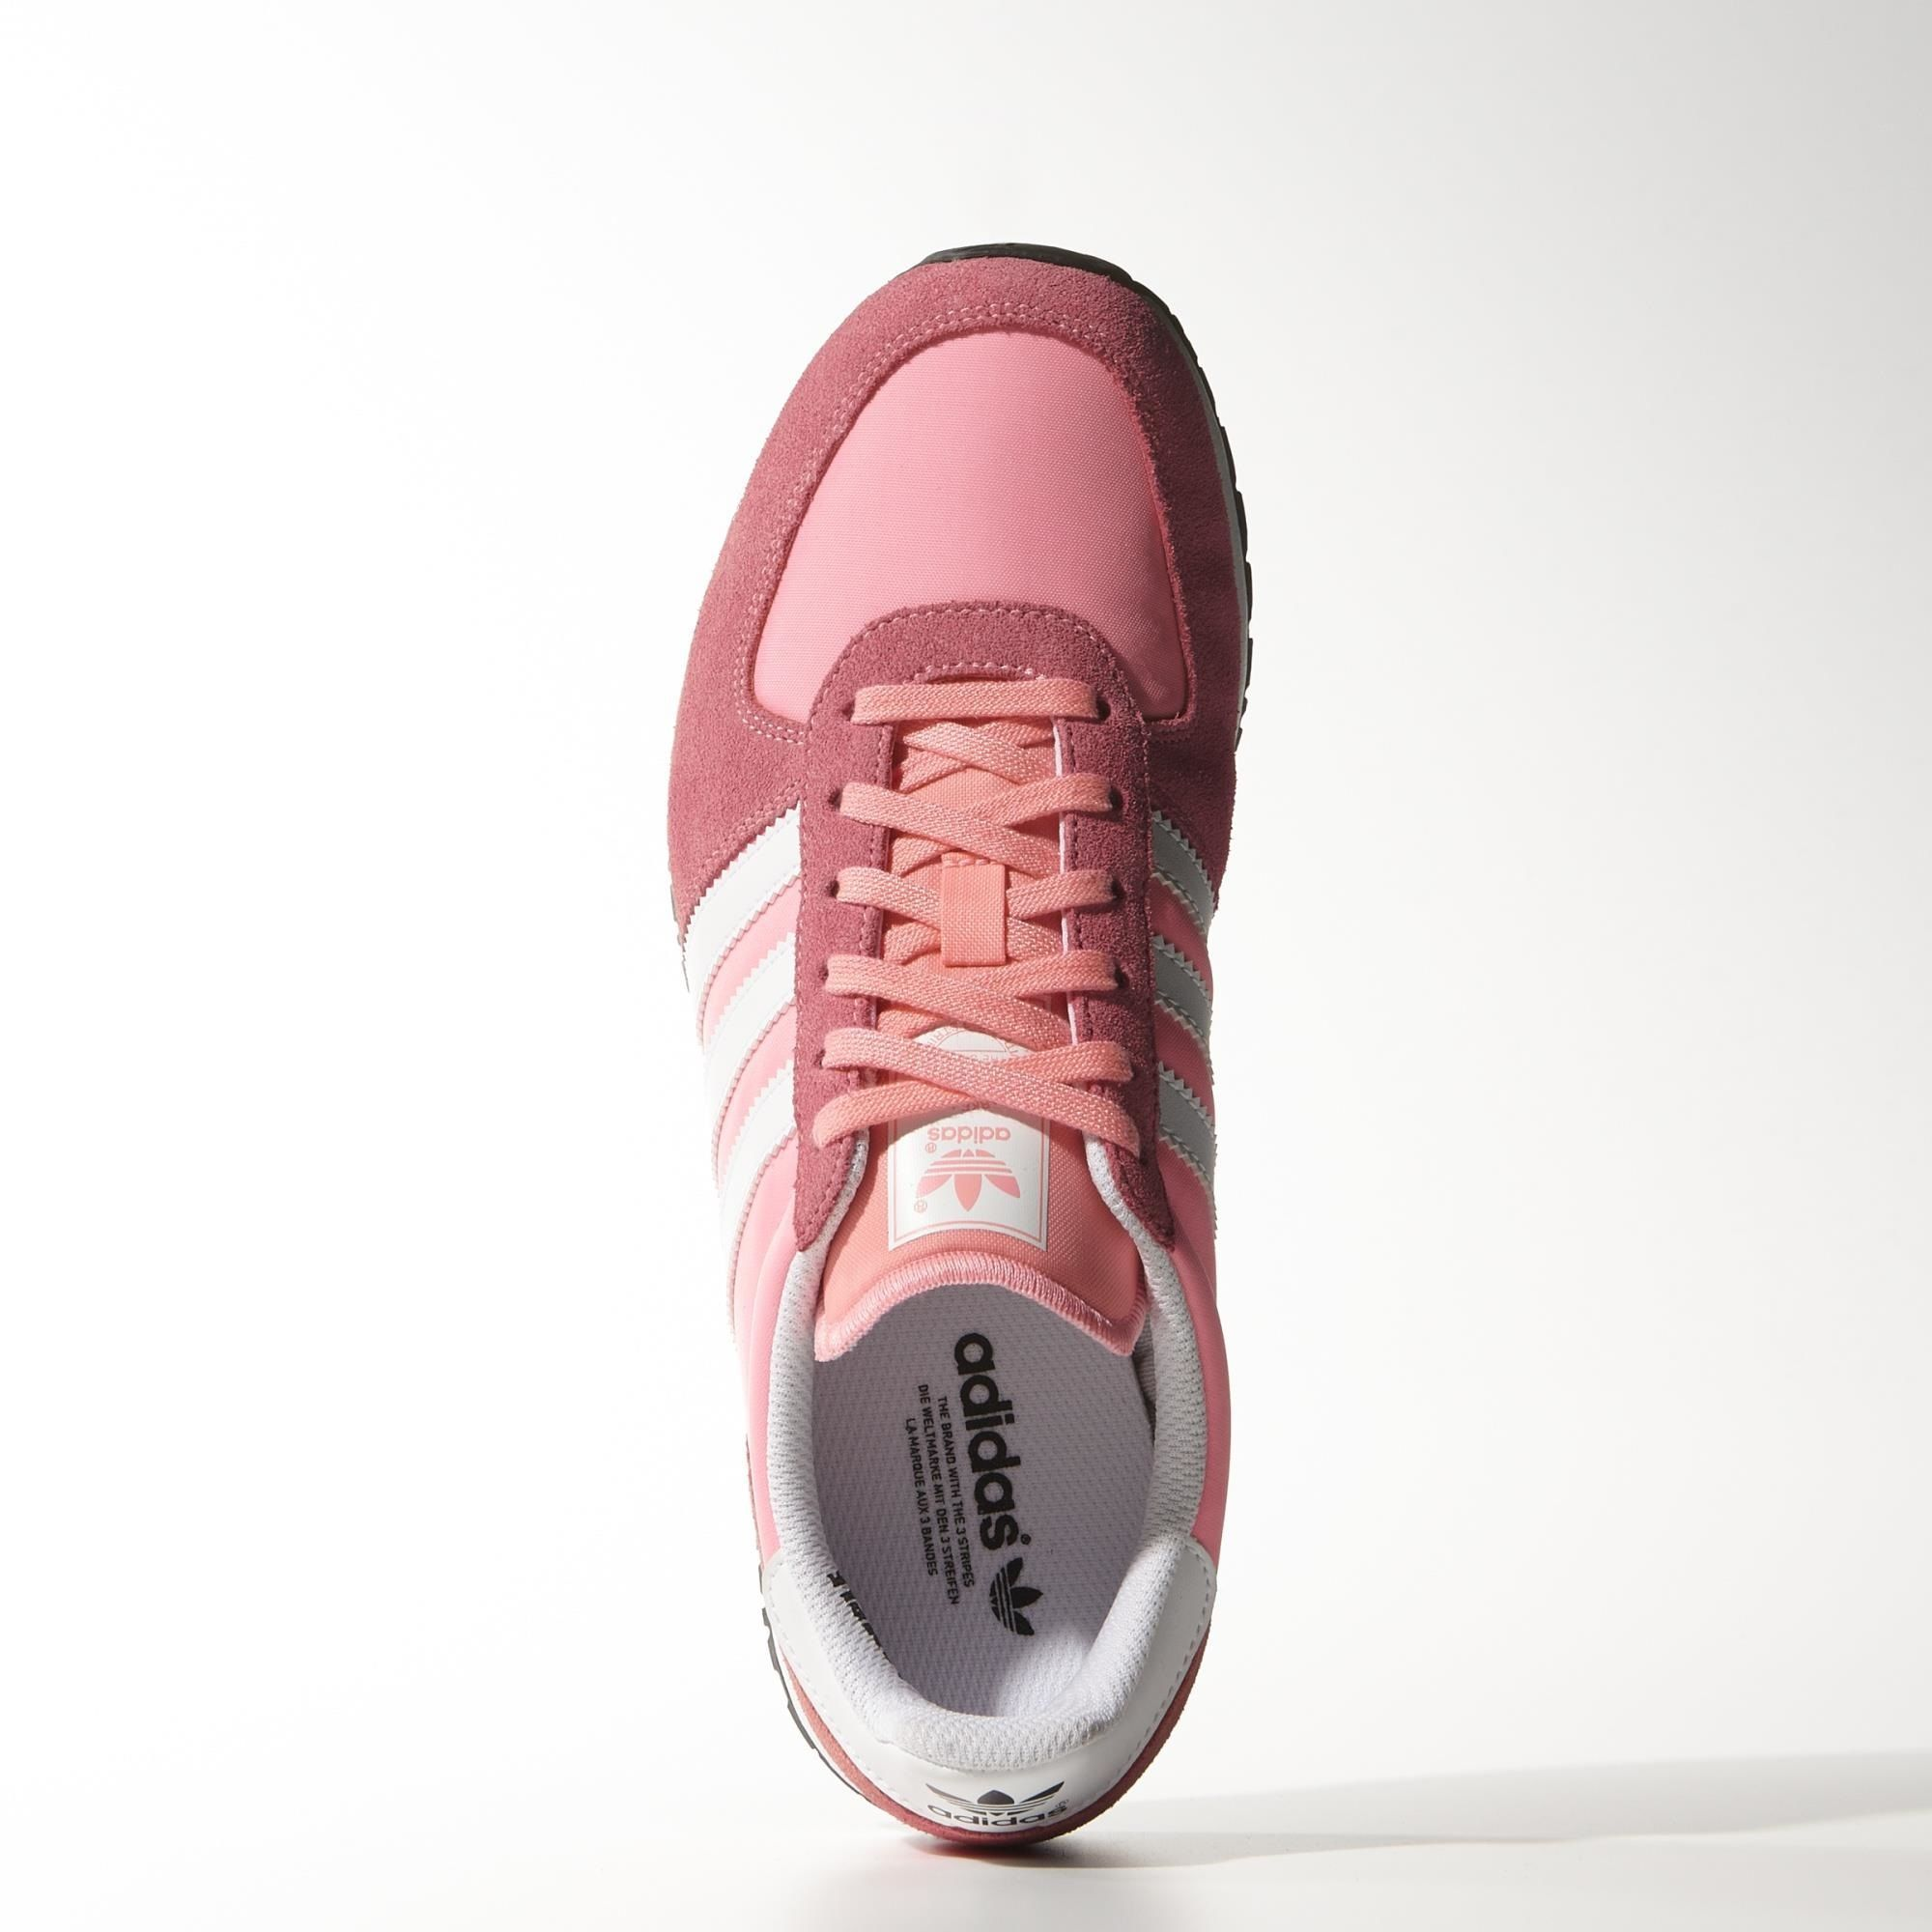 premium selection b179b 59c09 adidas - Tênis adistar Racer Feminino